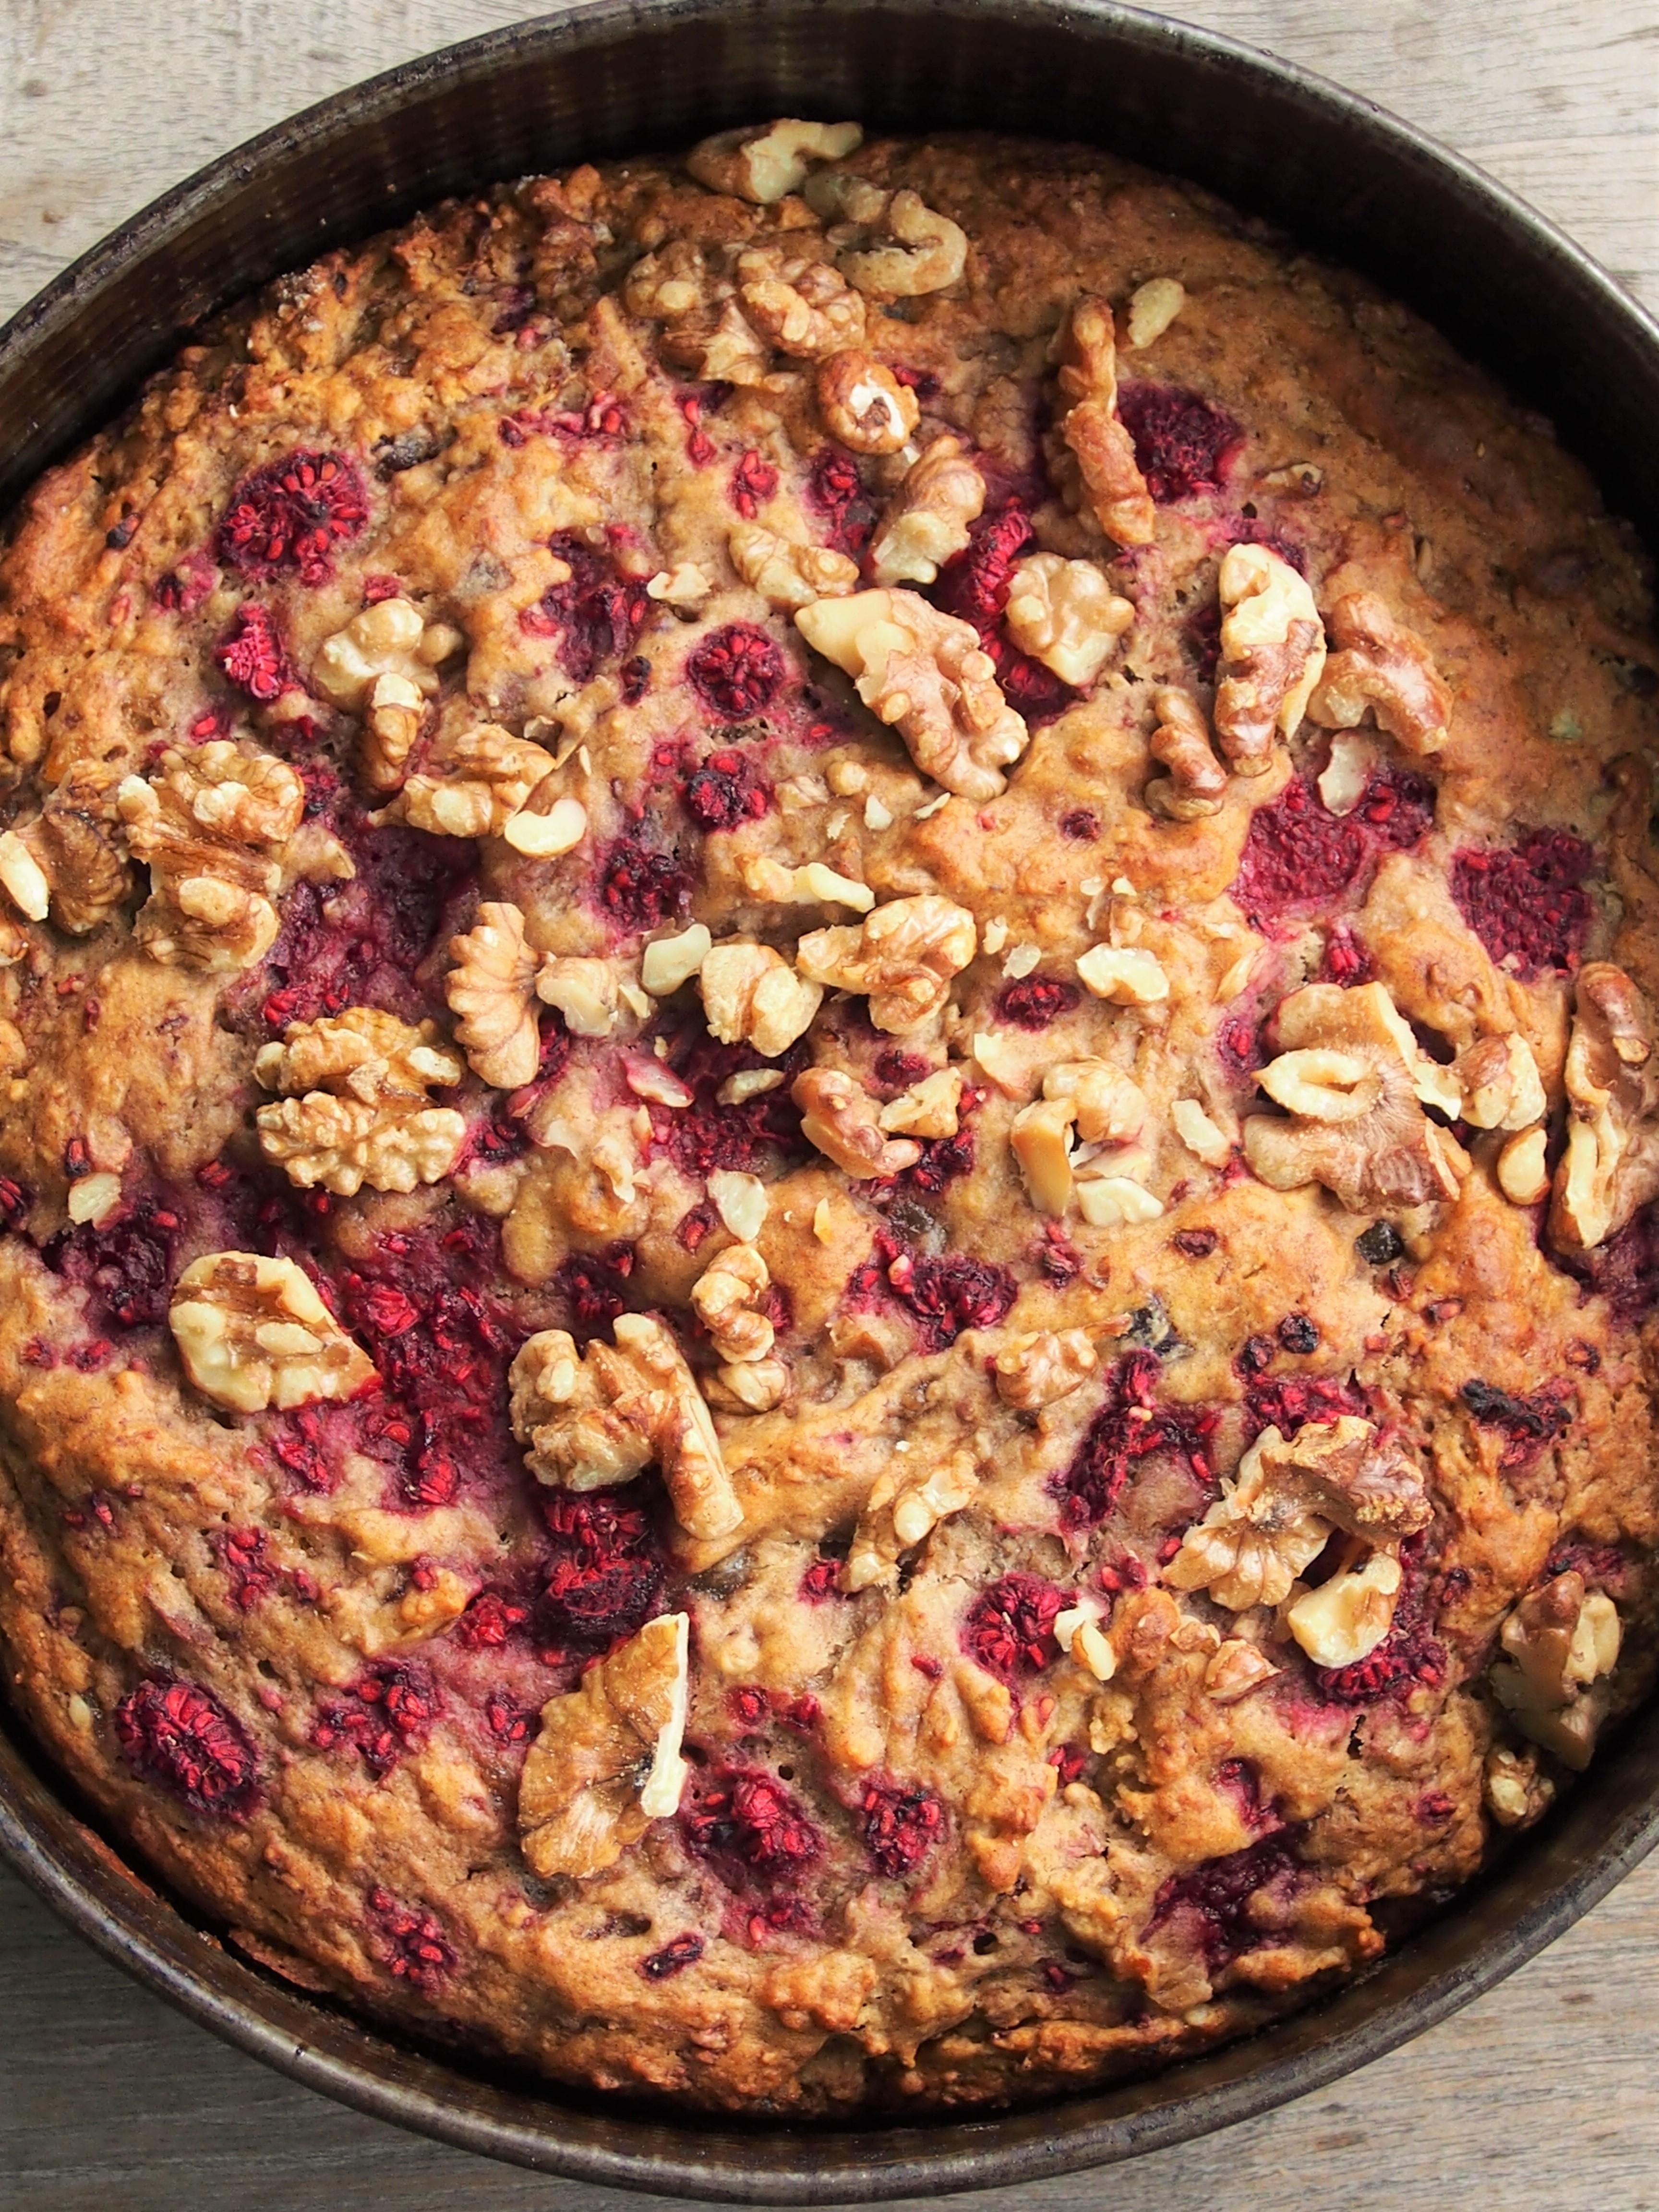 raspberry and walnut cake